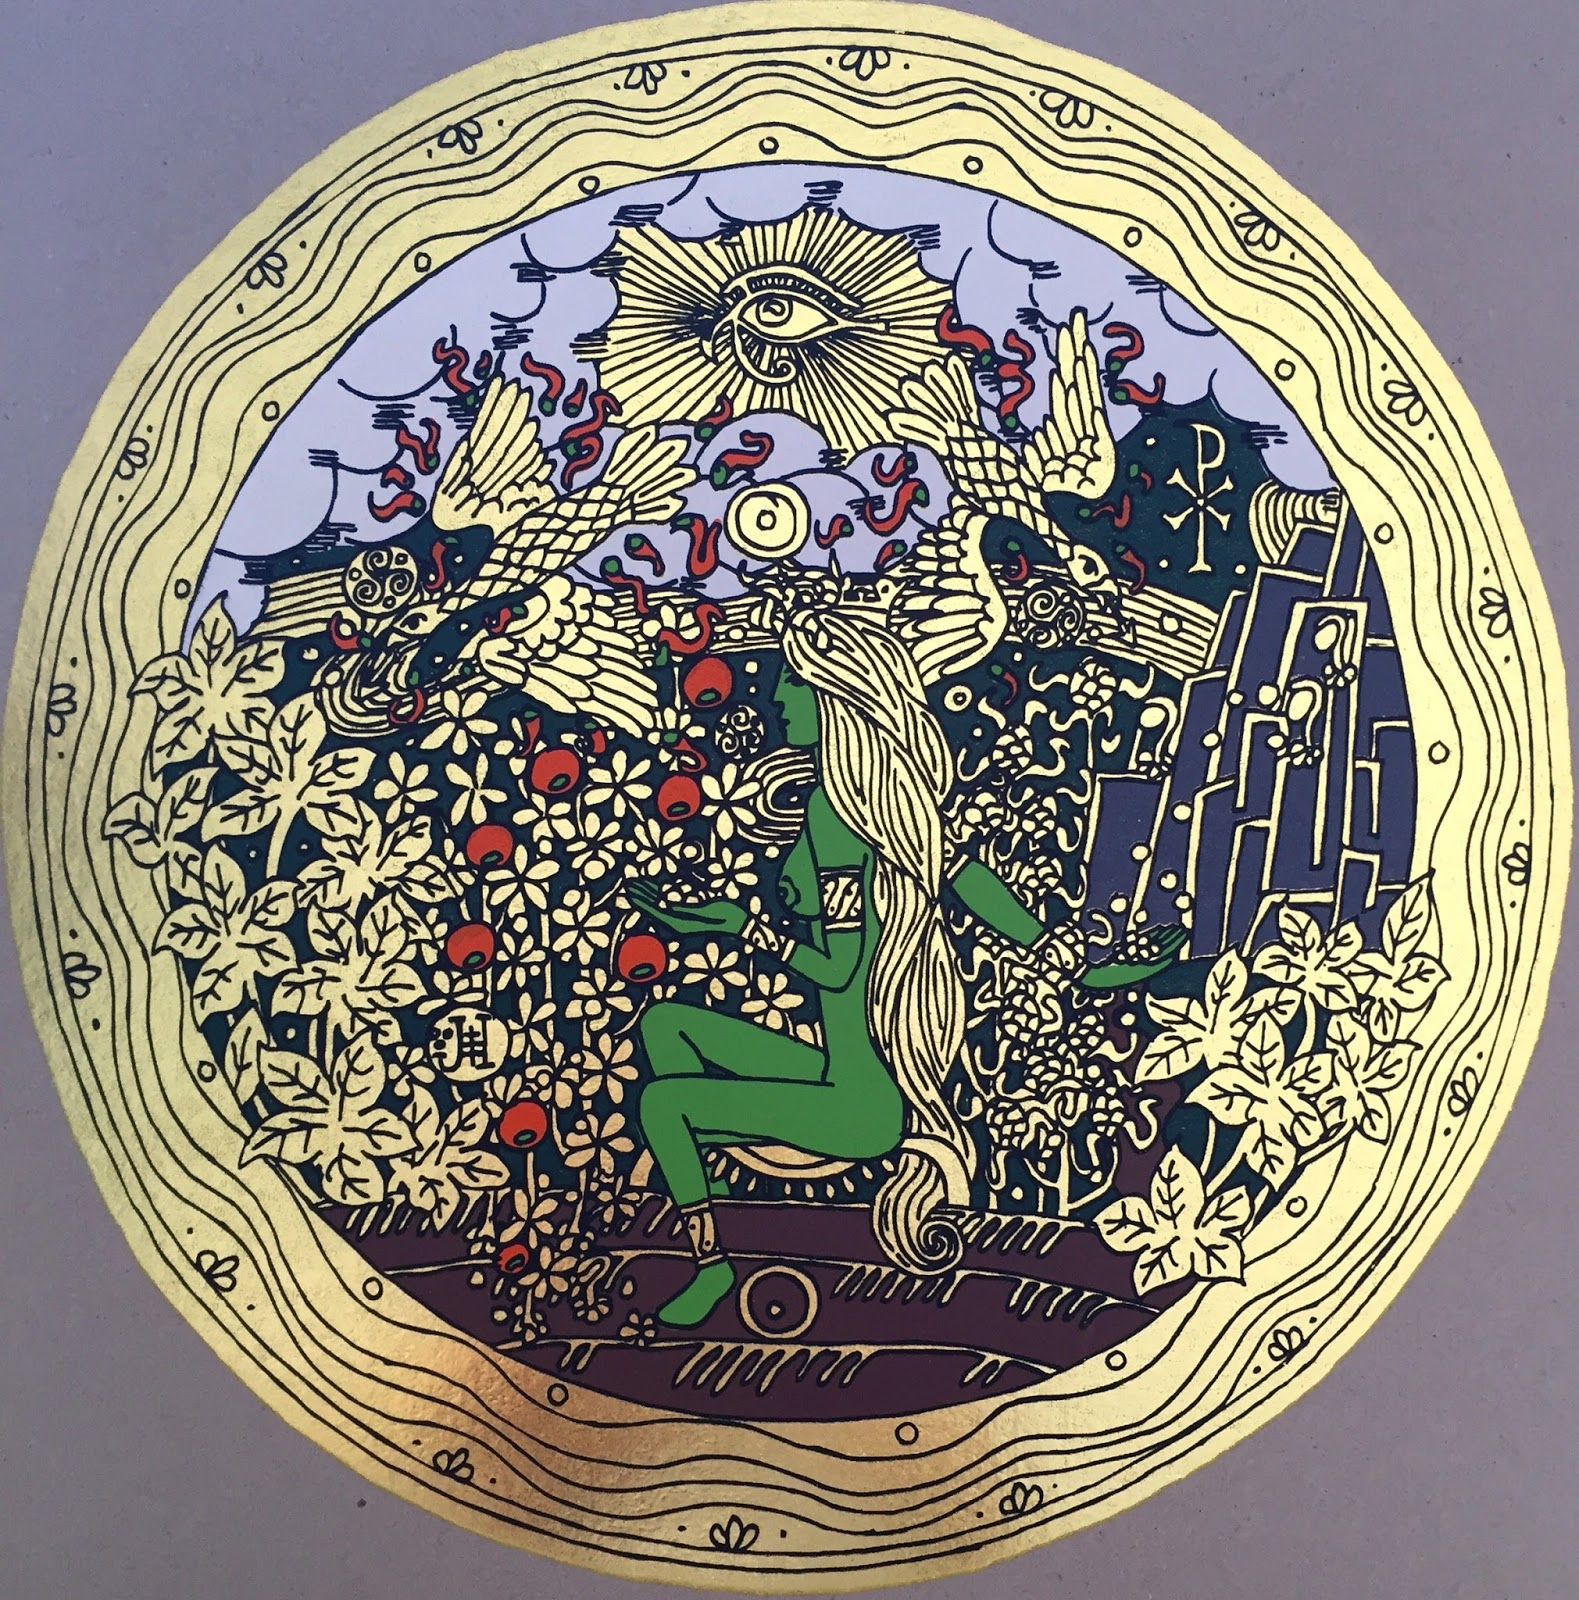 Obraz Kristův zlatý rozsévač